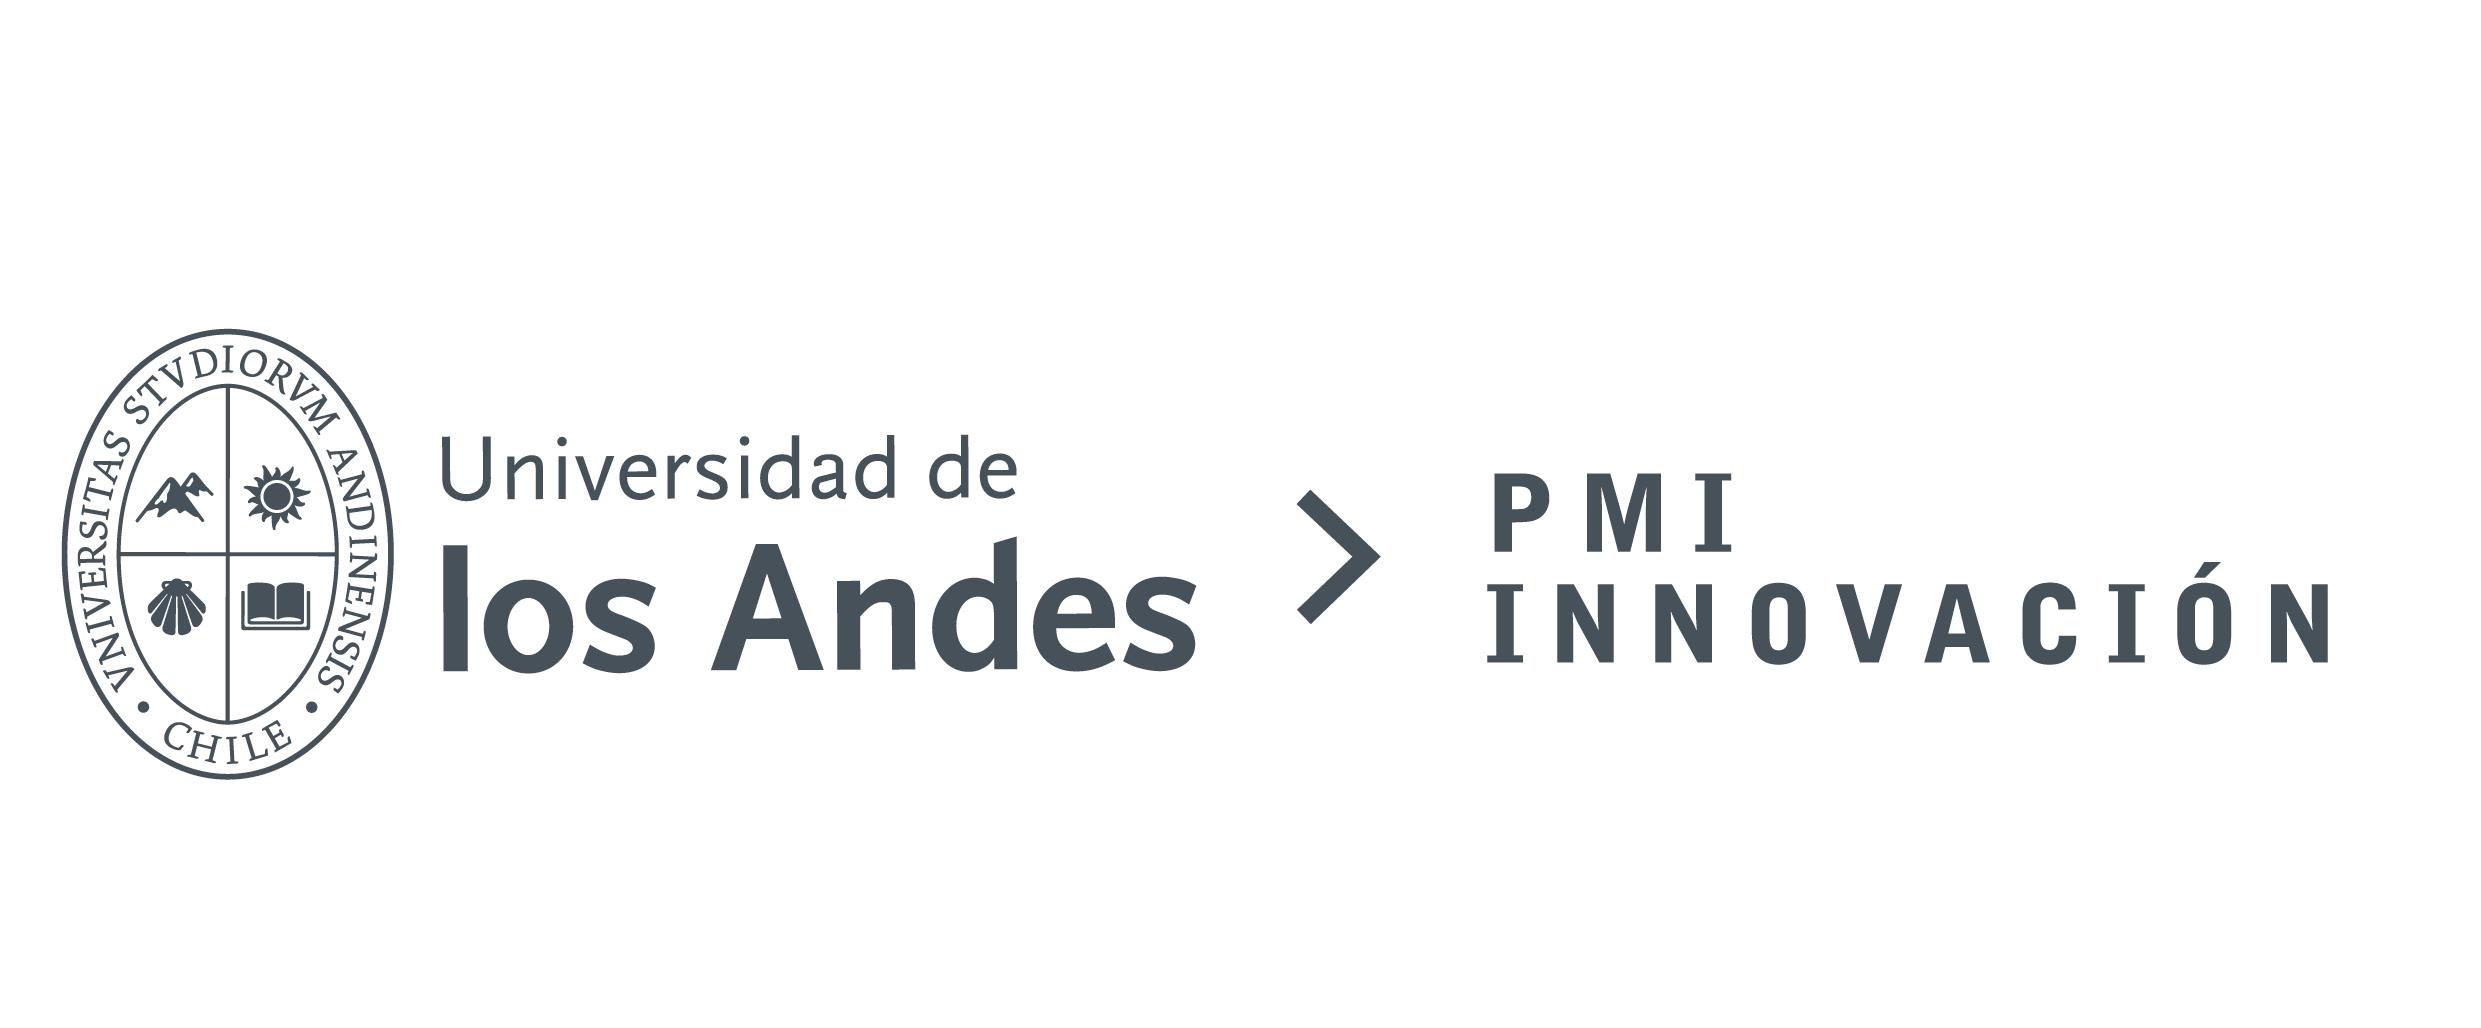 PMI Innovación